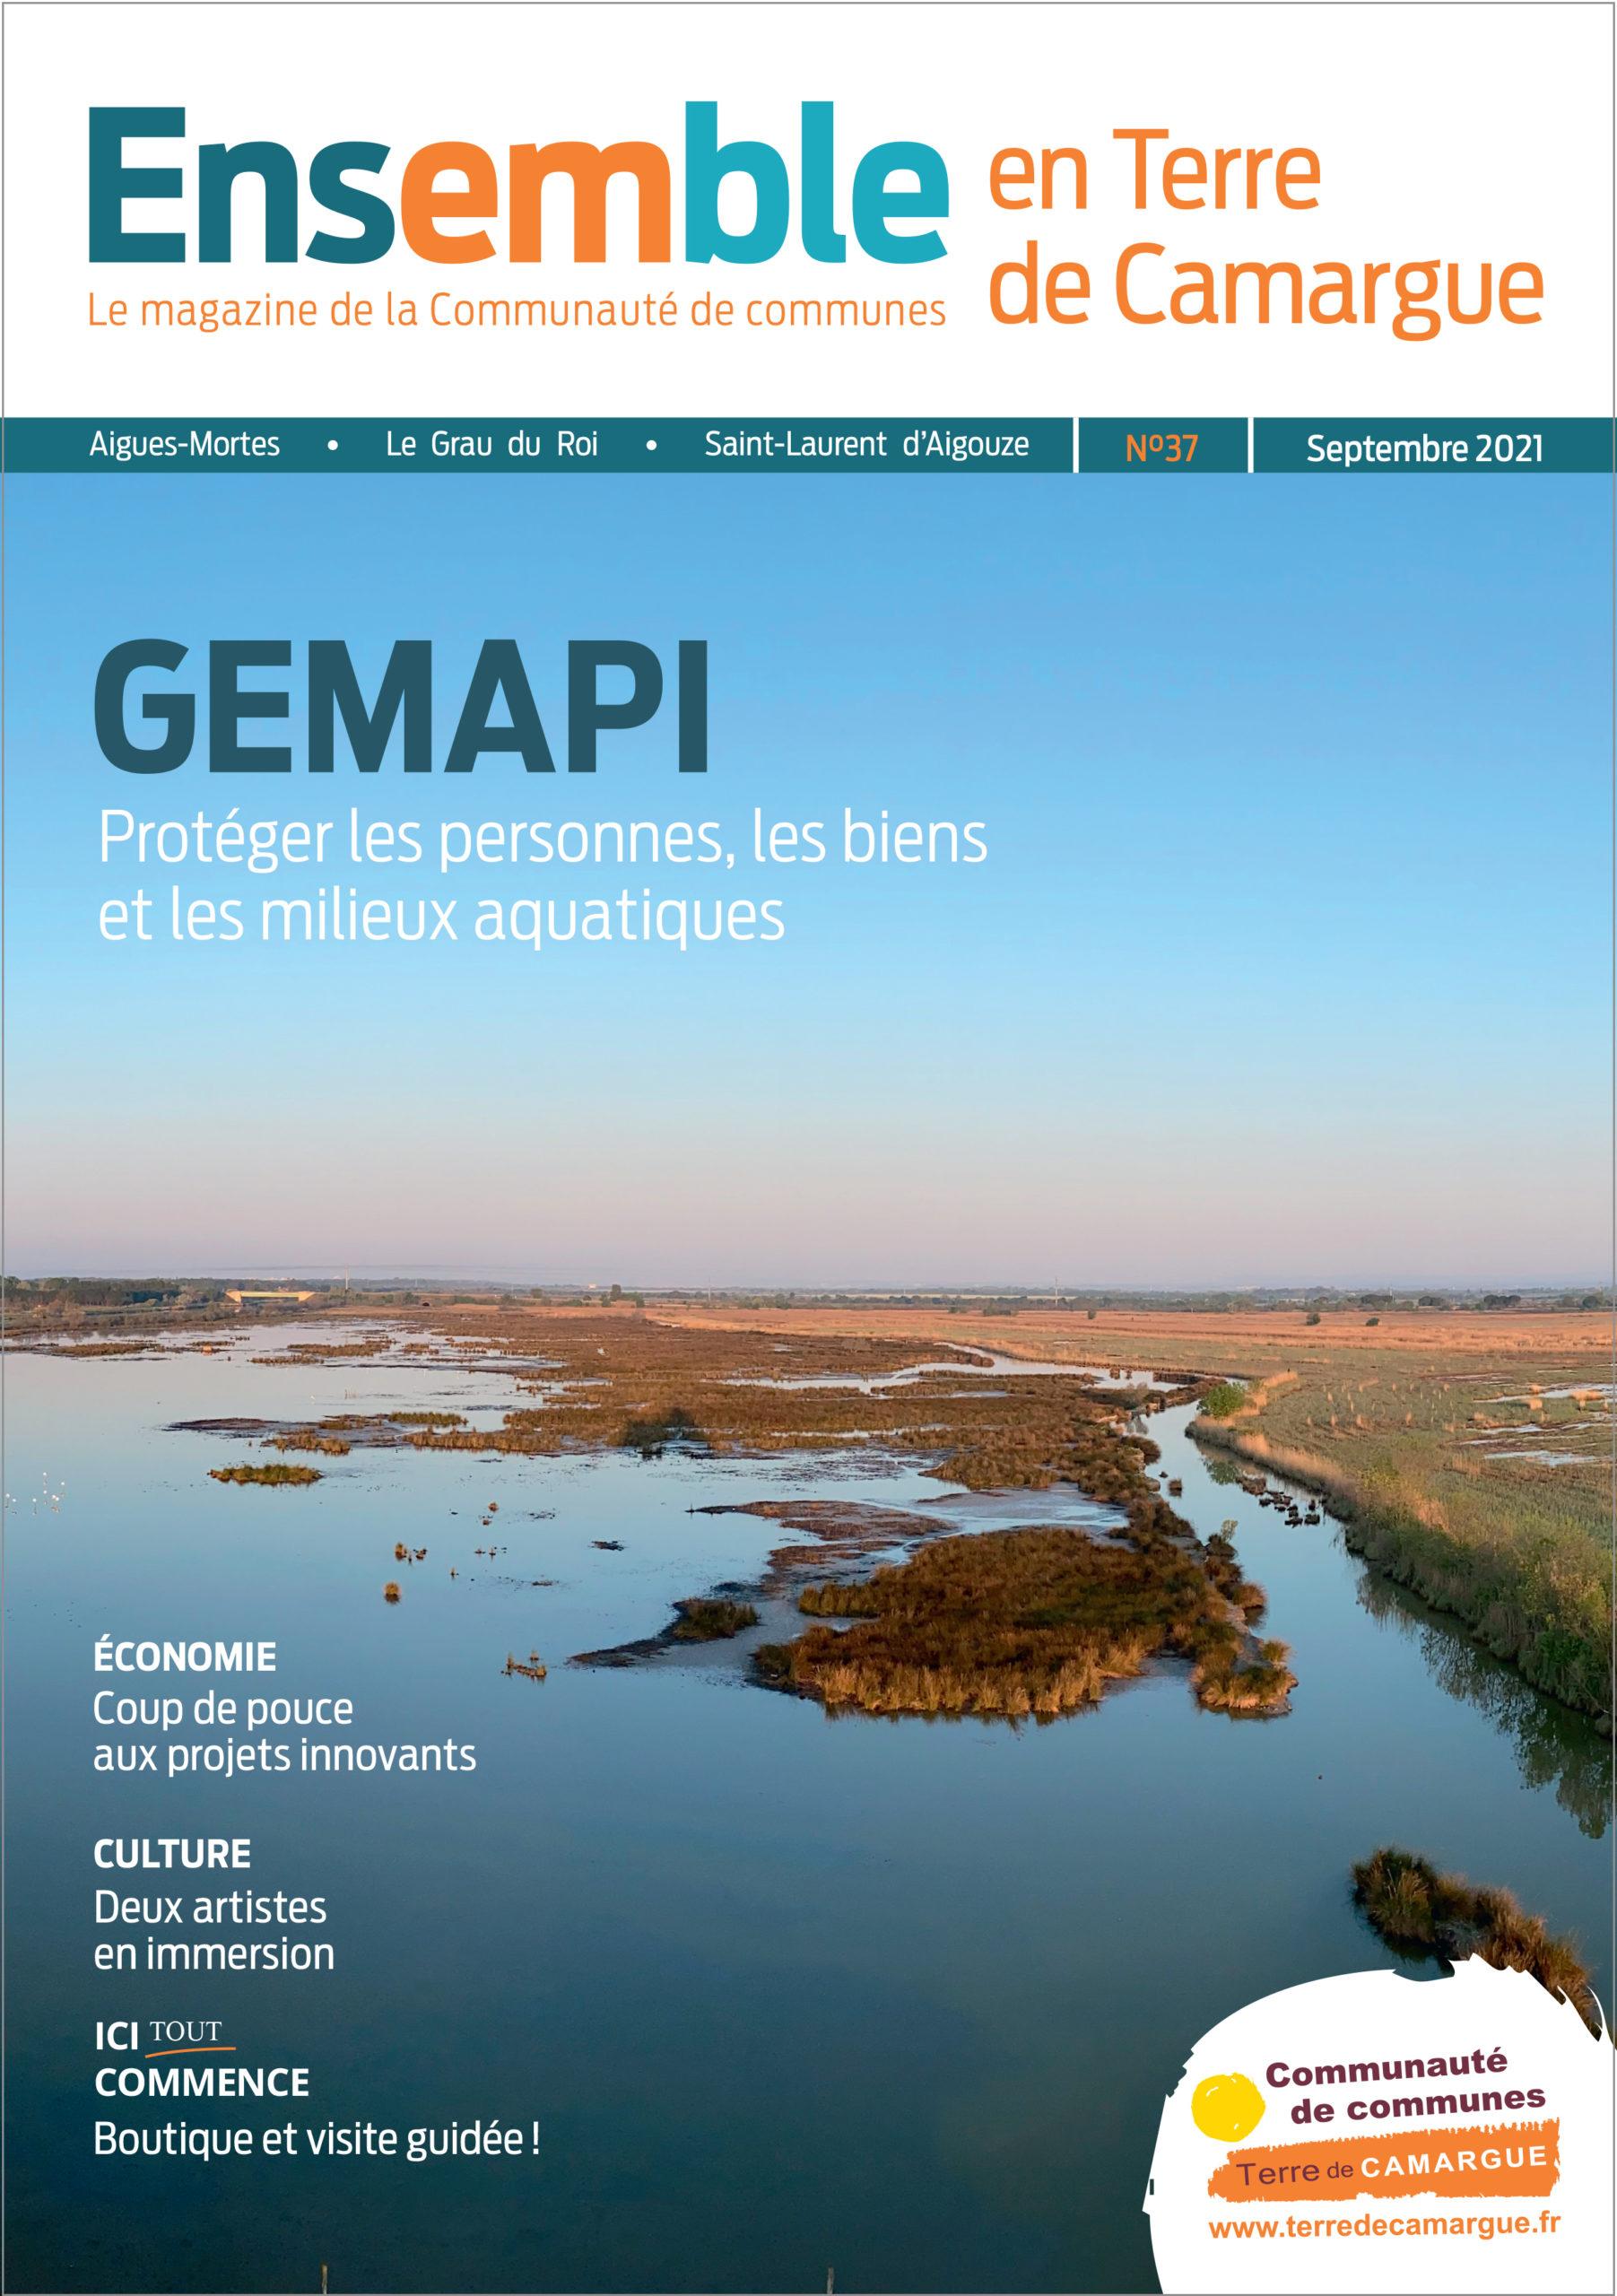 Magazine Ensemble en Terre de Camargue n°37, septembre 2021